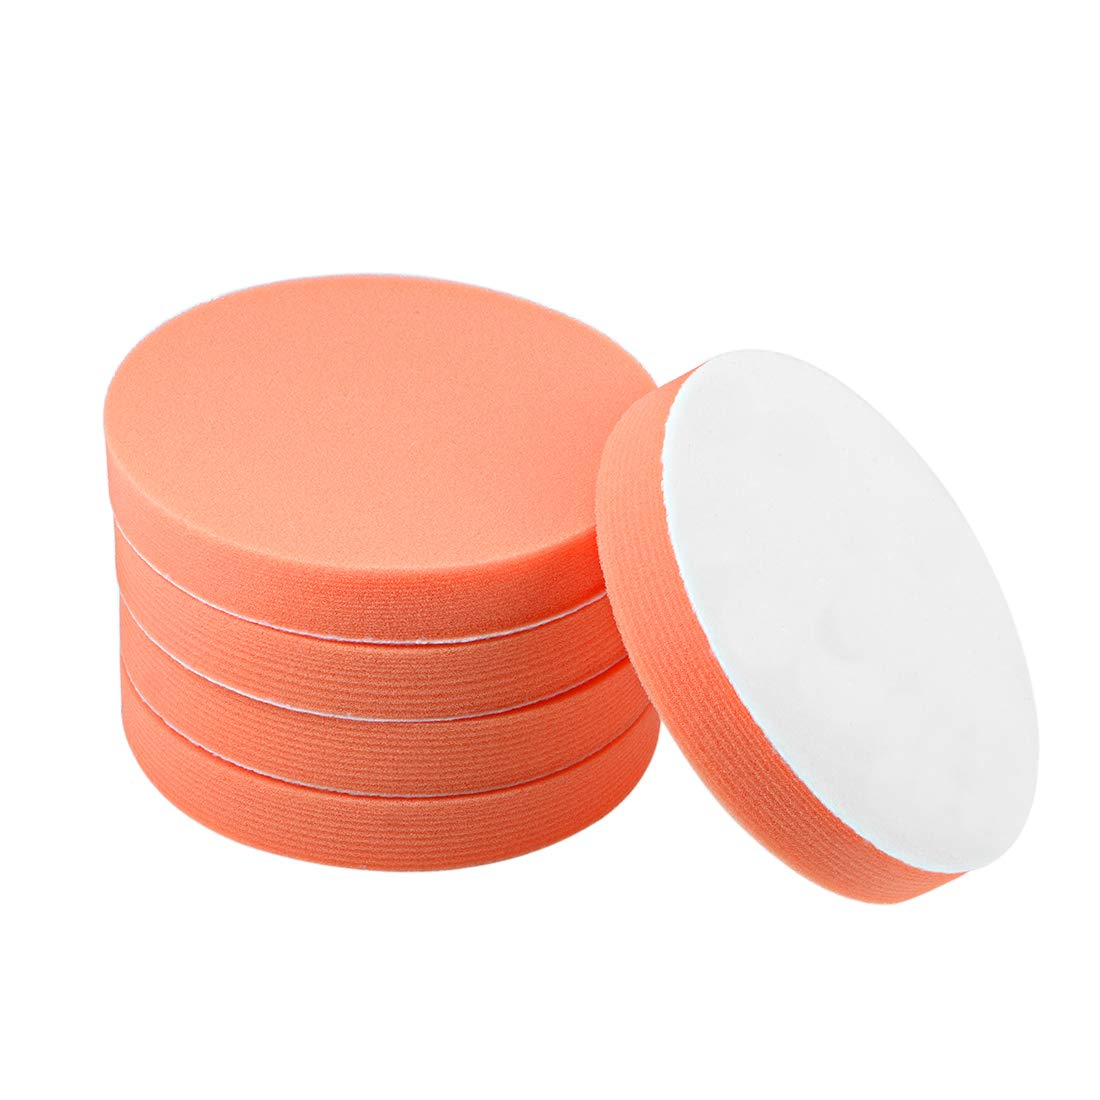 uxcell 3 Foam Drill Polishing Pad Kit Sponge Pads for Waxing Sealing Glaze 5pcs